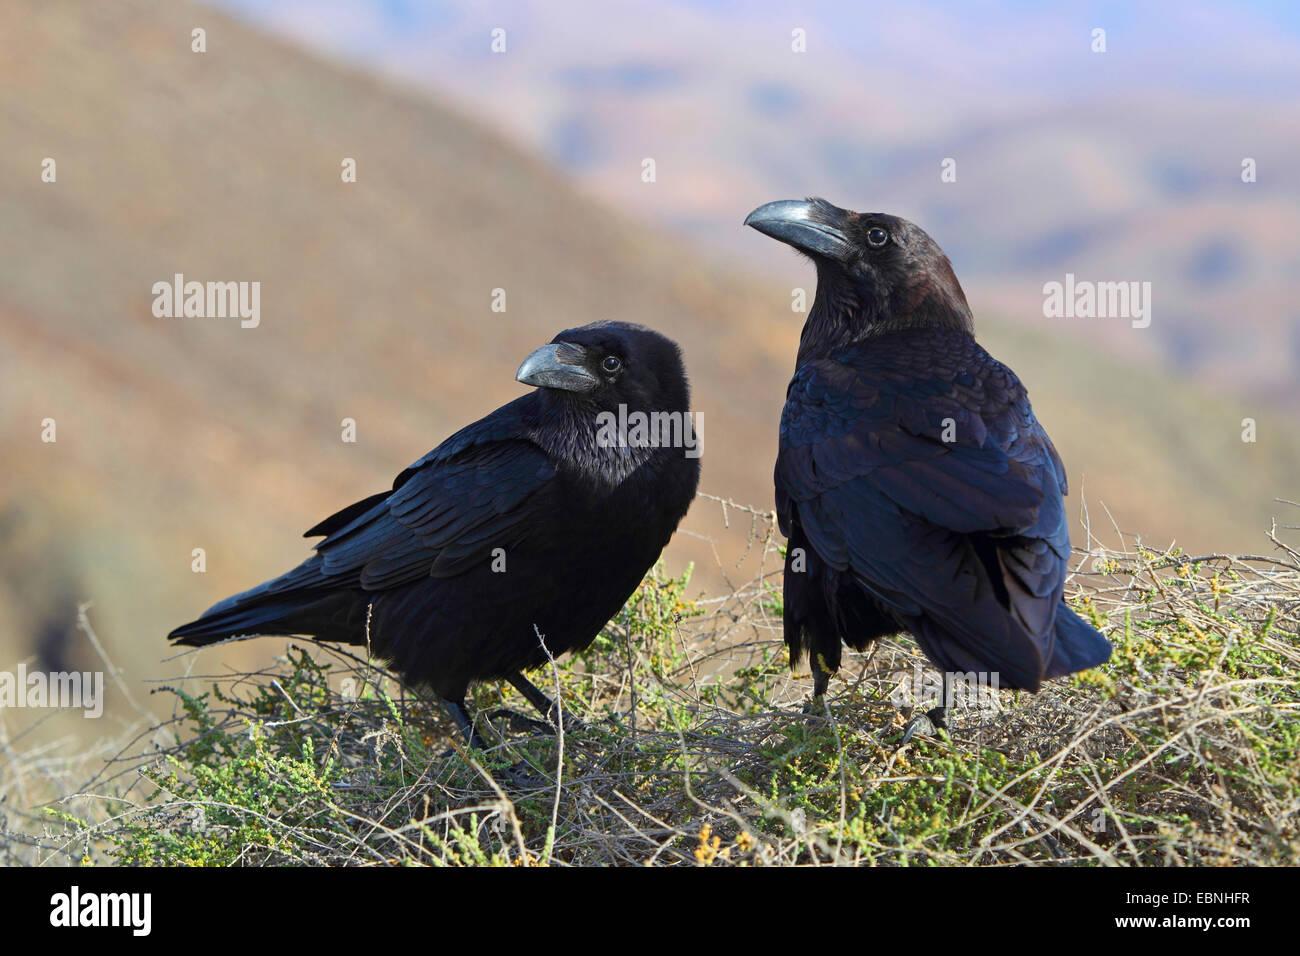 Kanarischen Inseln Raven, Kanarische Raven (Corvus Corax Tingitanus, Corvus Tingitanus) koppeln sitzt auf einem Stockbild